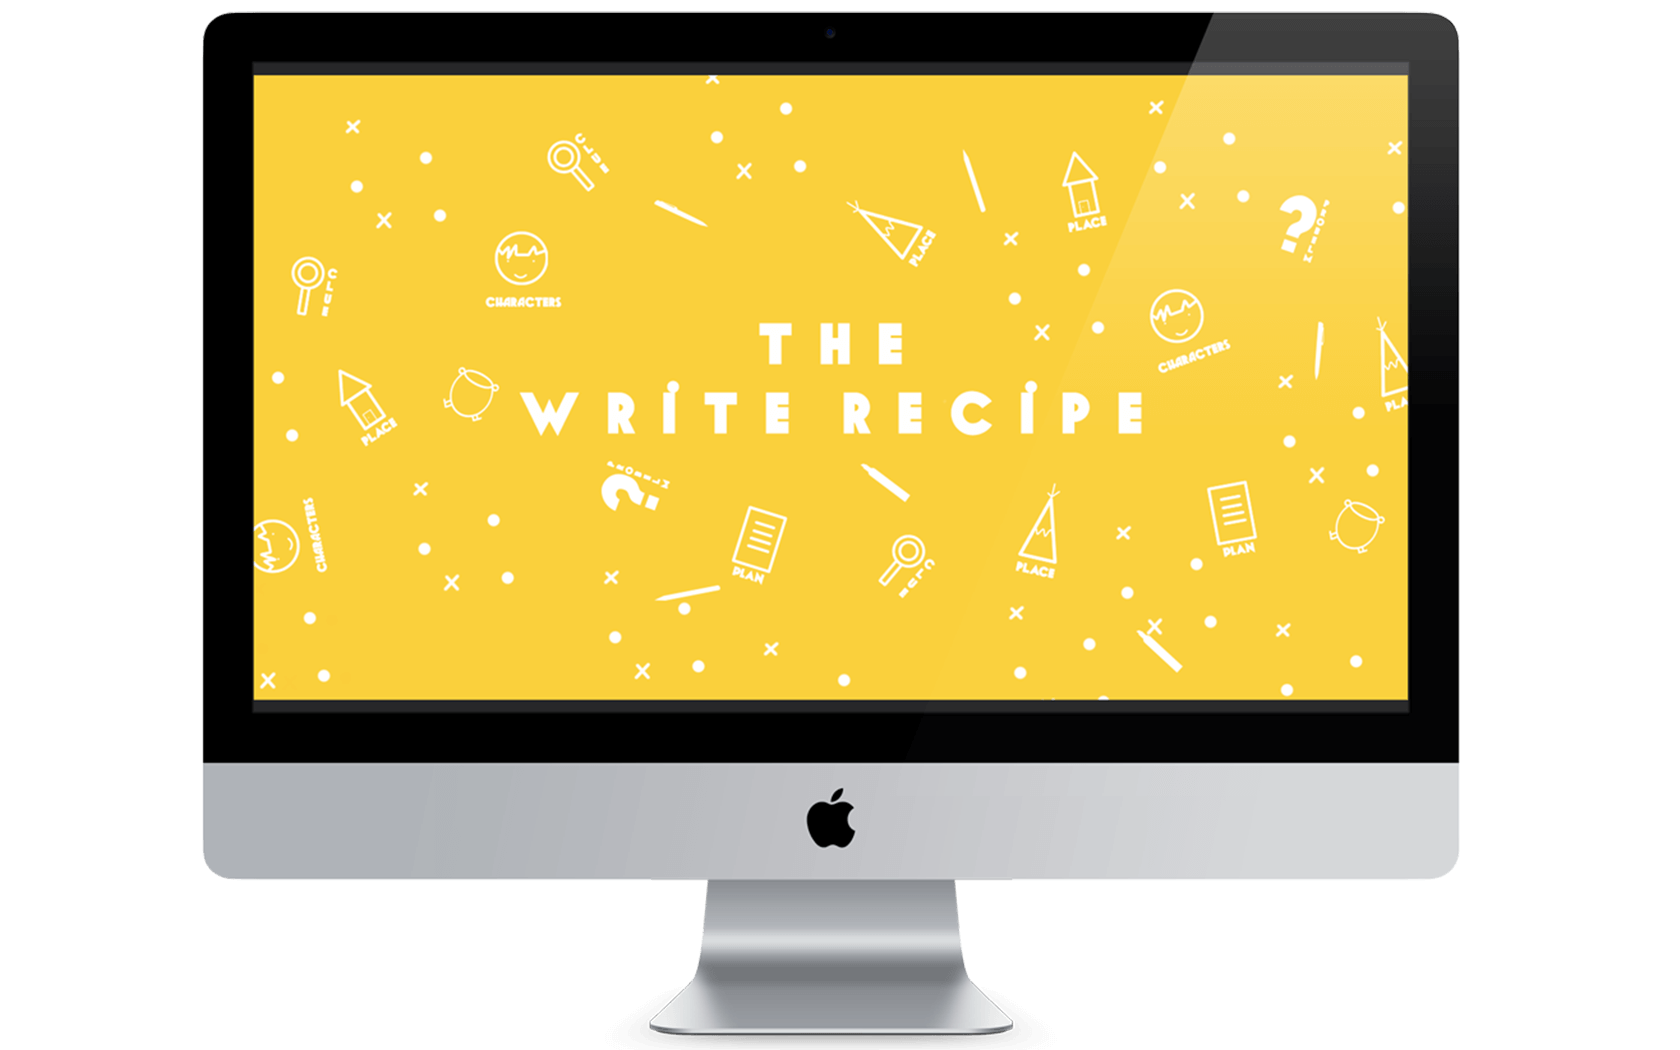 The Write Recipe Online Course